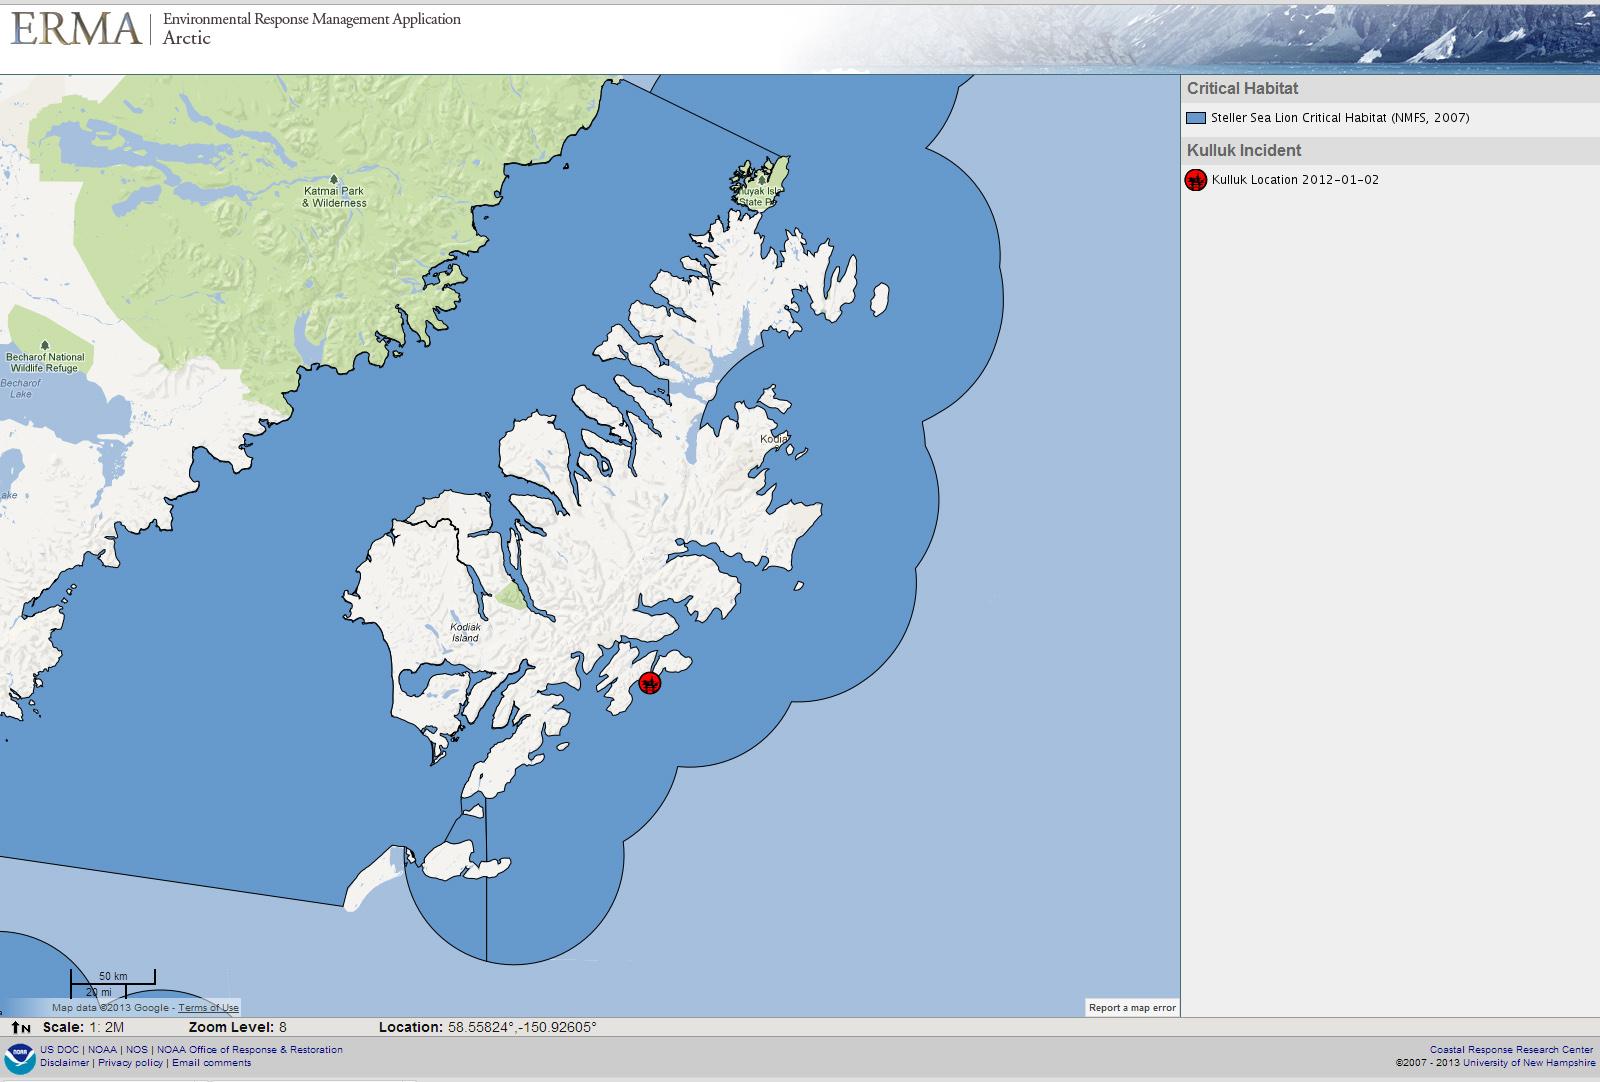 Kodiak Island Alaska Map.Noaa Responds To Shell Drilling Rig Kulluk Grounding In Gulf Of